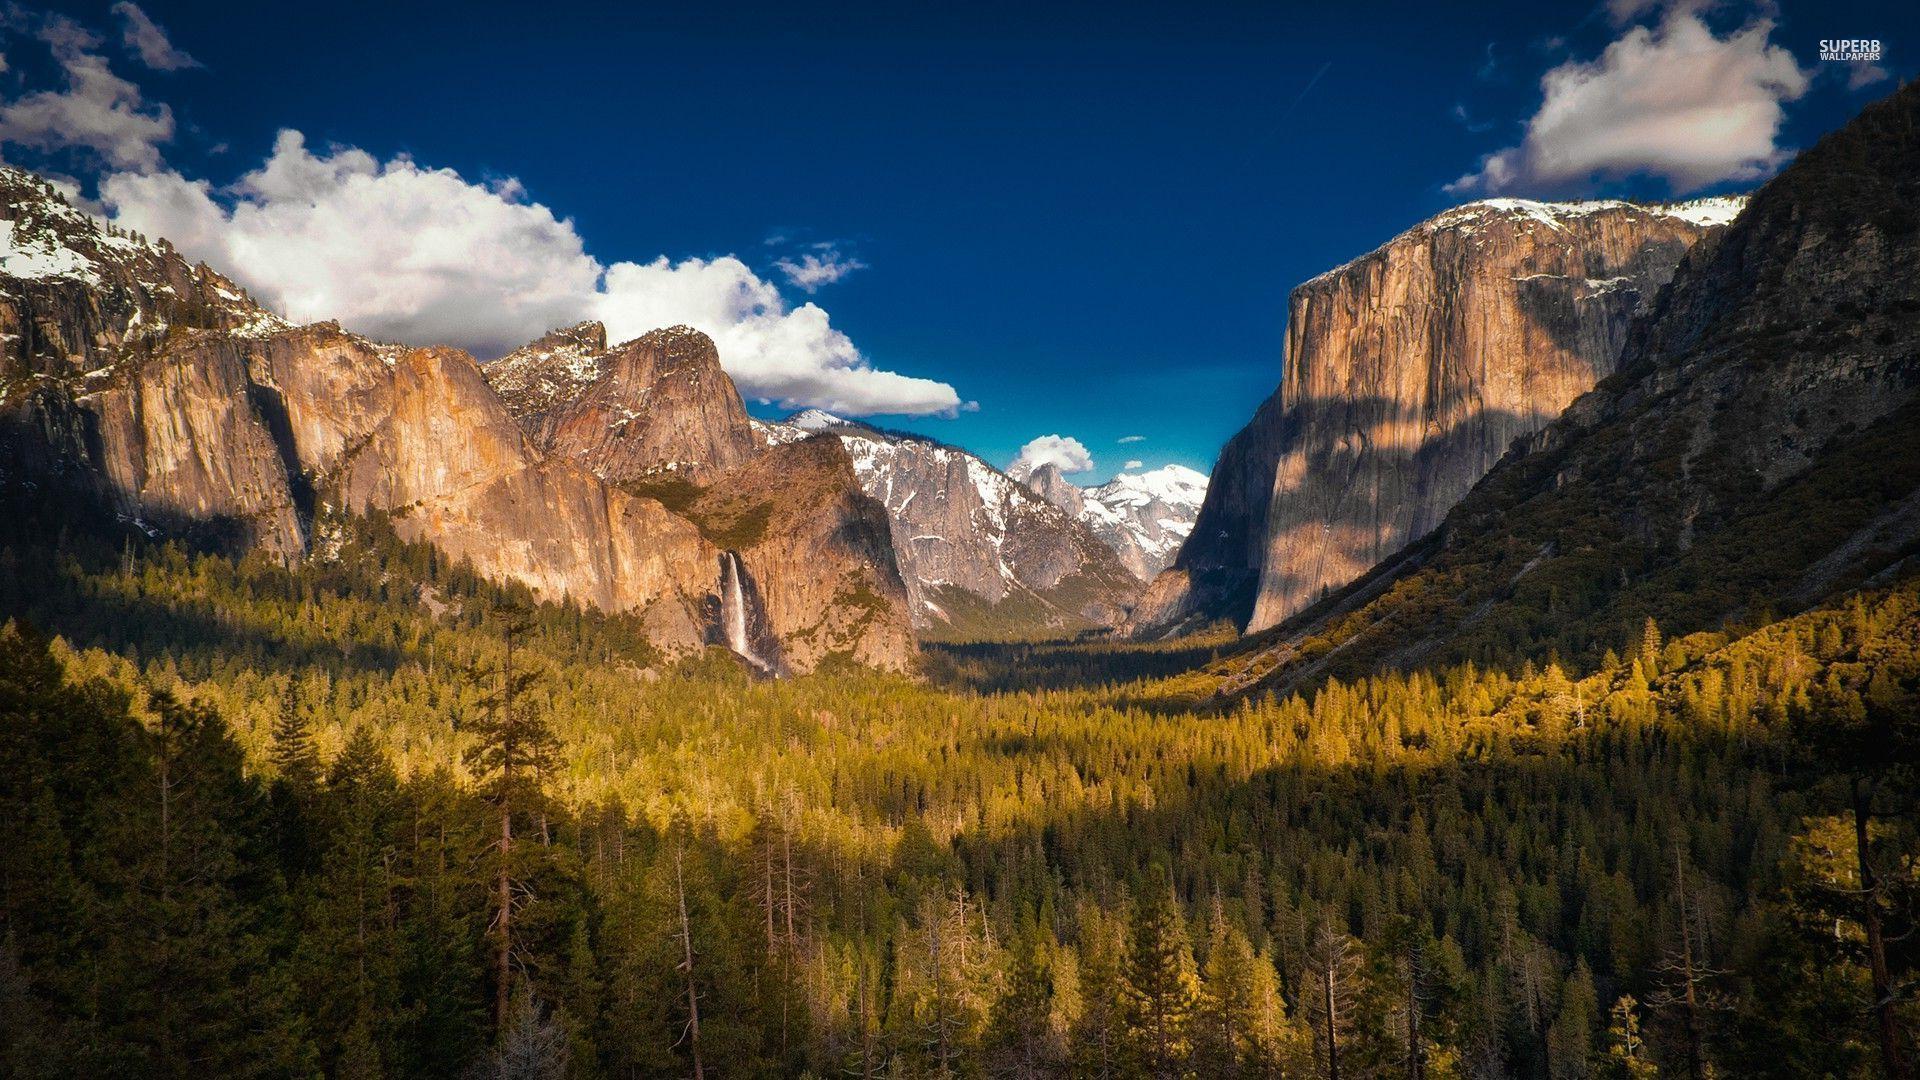 Yosemite Mountain Landscape Wallpaper HD 9 High Resolution Wallpaper 1920x1080